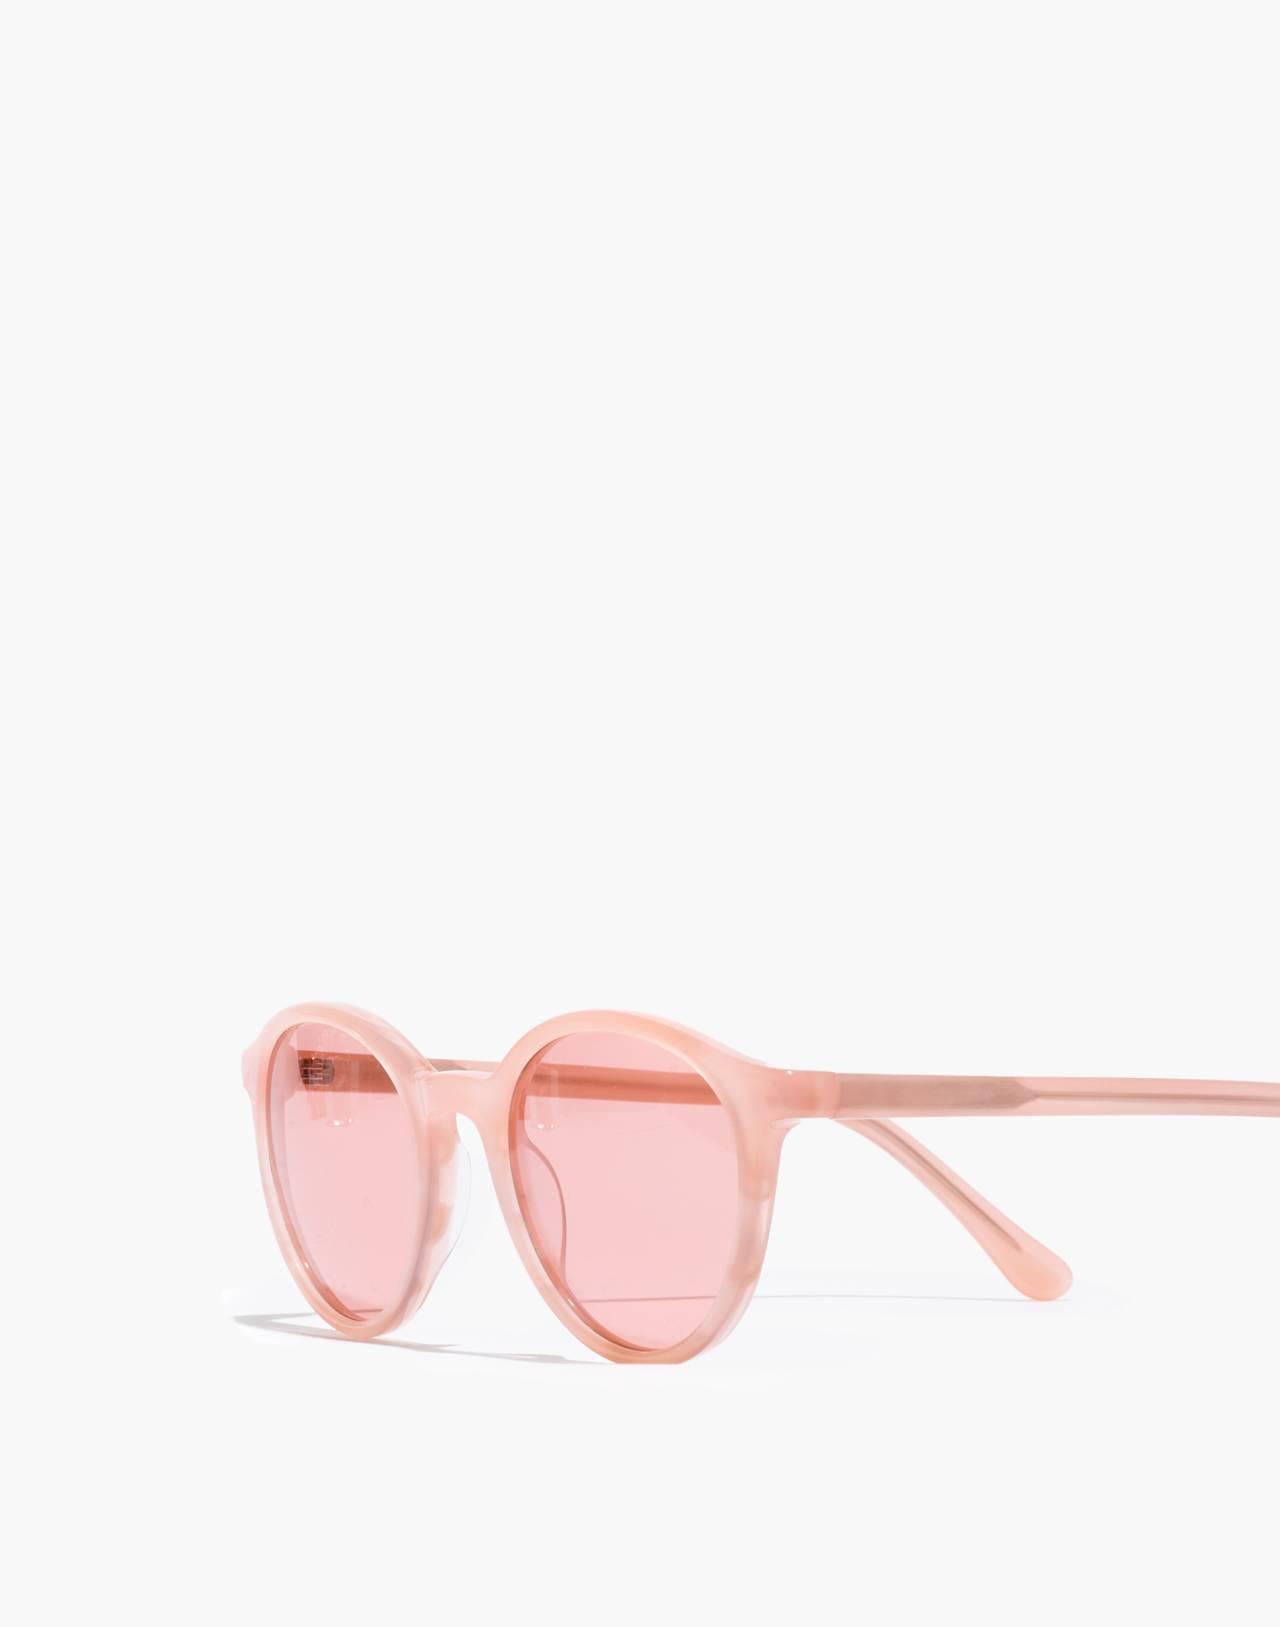 Layton Sunglasses in sweetheart blush image 2